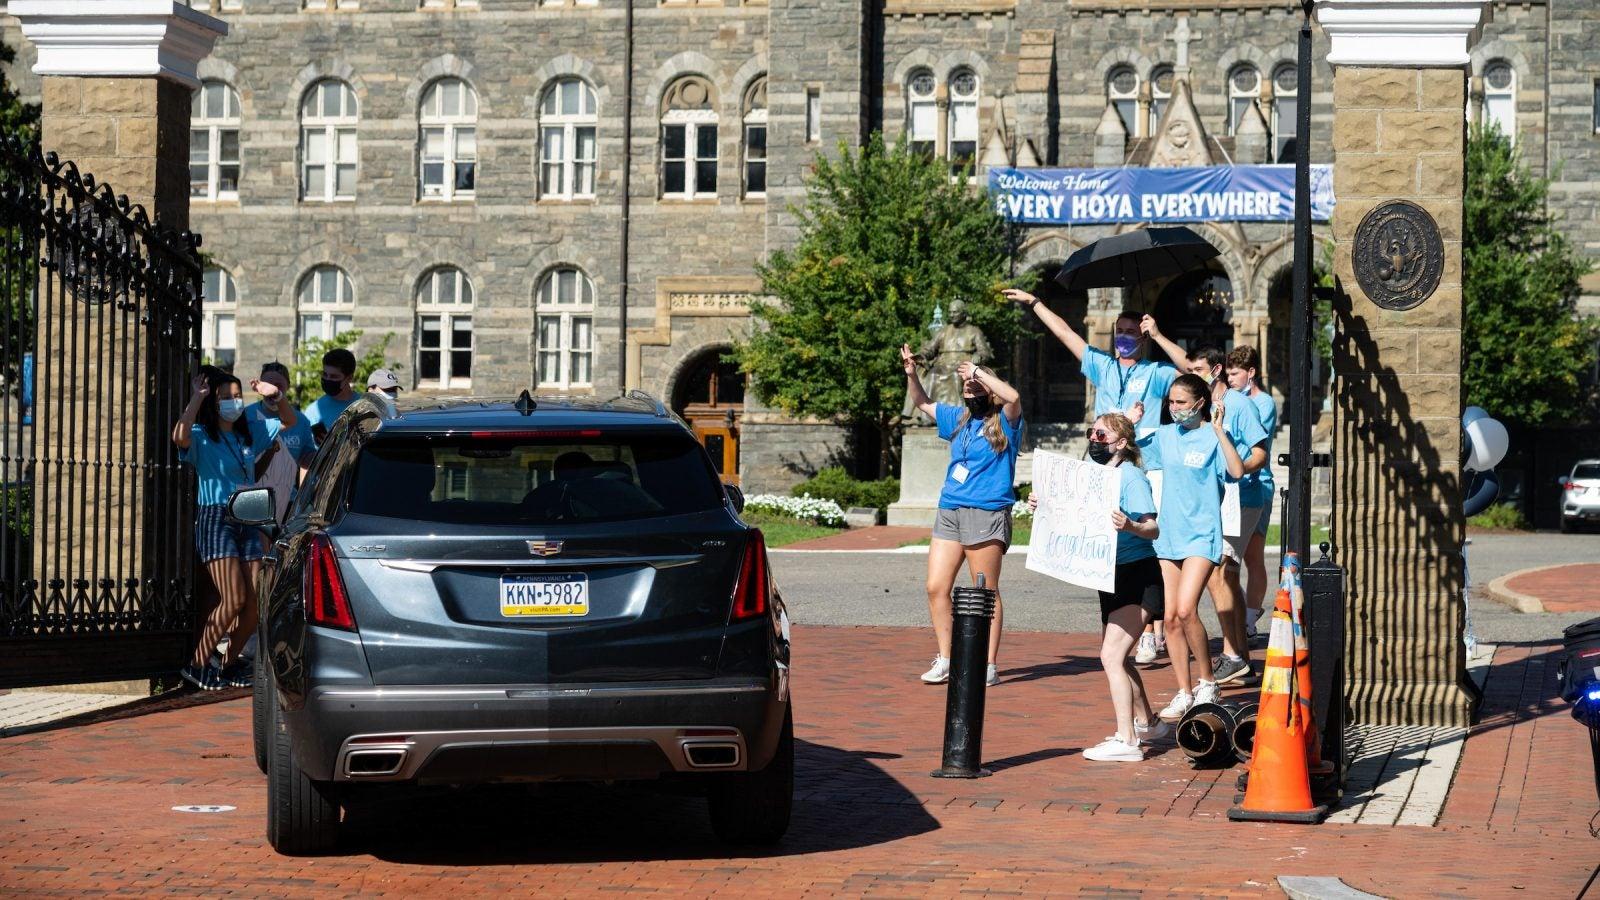 Orientation Advisors cheer as a car drives through the front gates